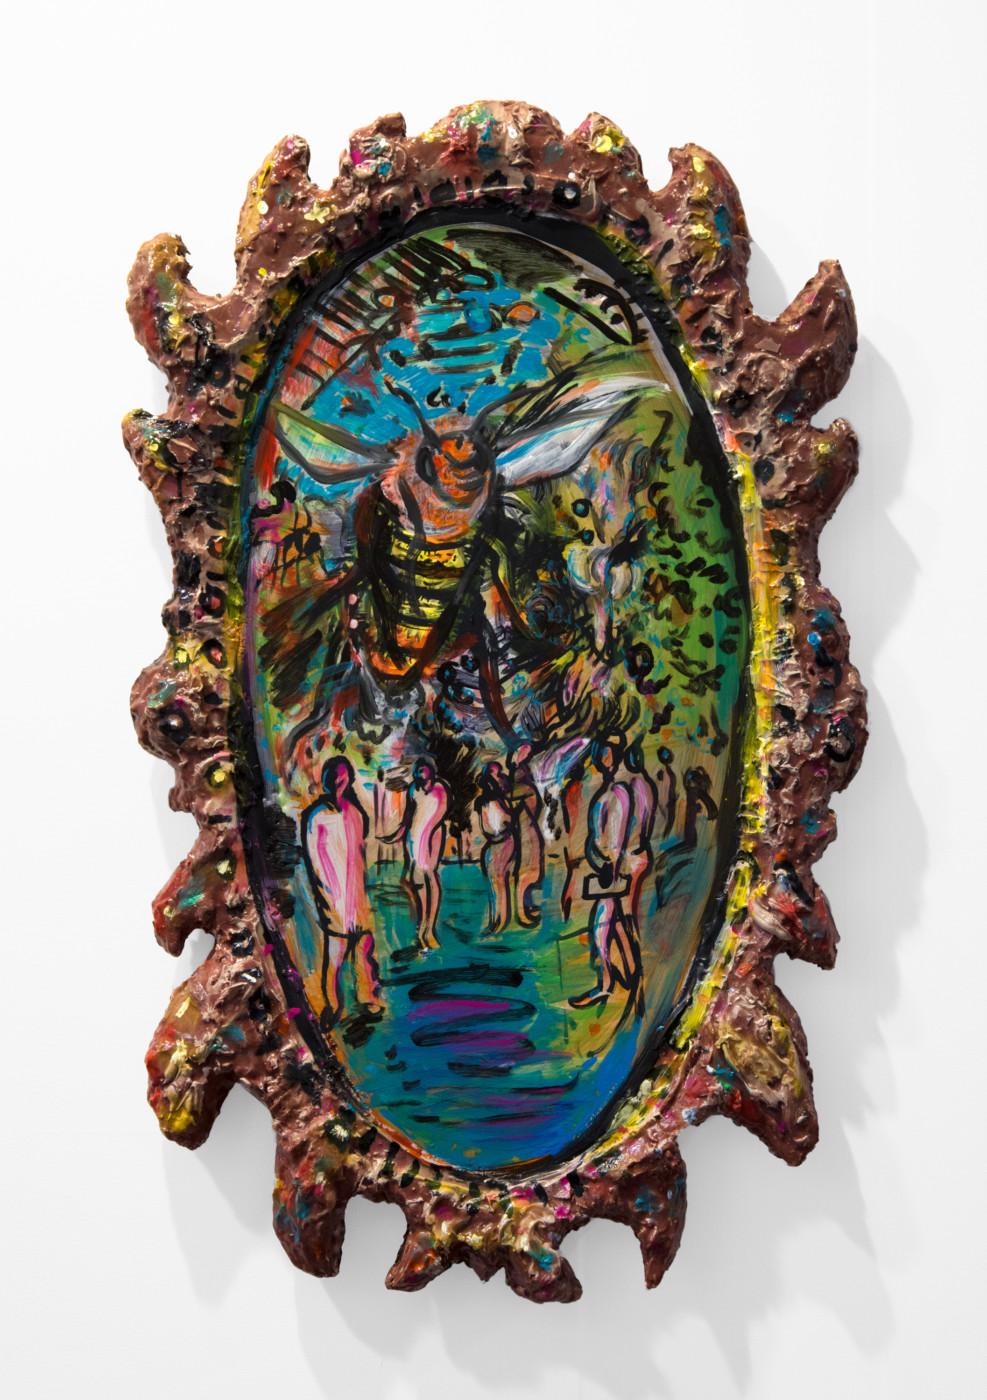 JOHN RUSSELL  WASP , 2018 Acrylic on fiberglass 119 x 73 x 9 cm / 46 7/8 x 28 3/4 x 3 1/2 in - High Art Gallery Paris